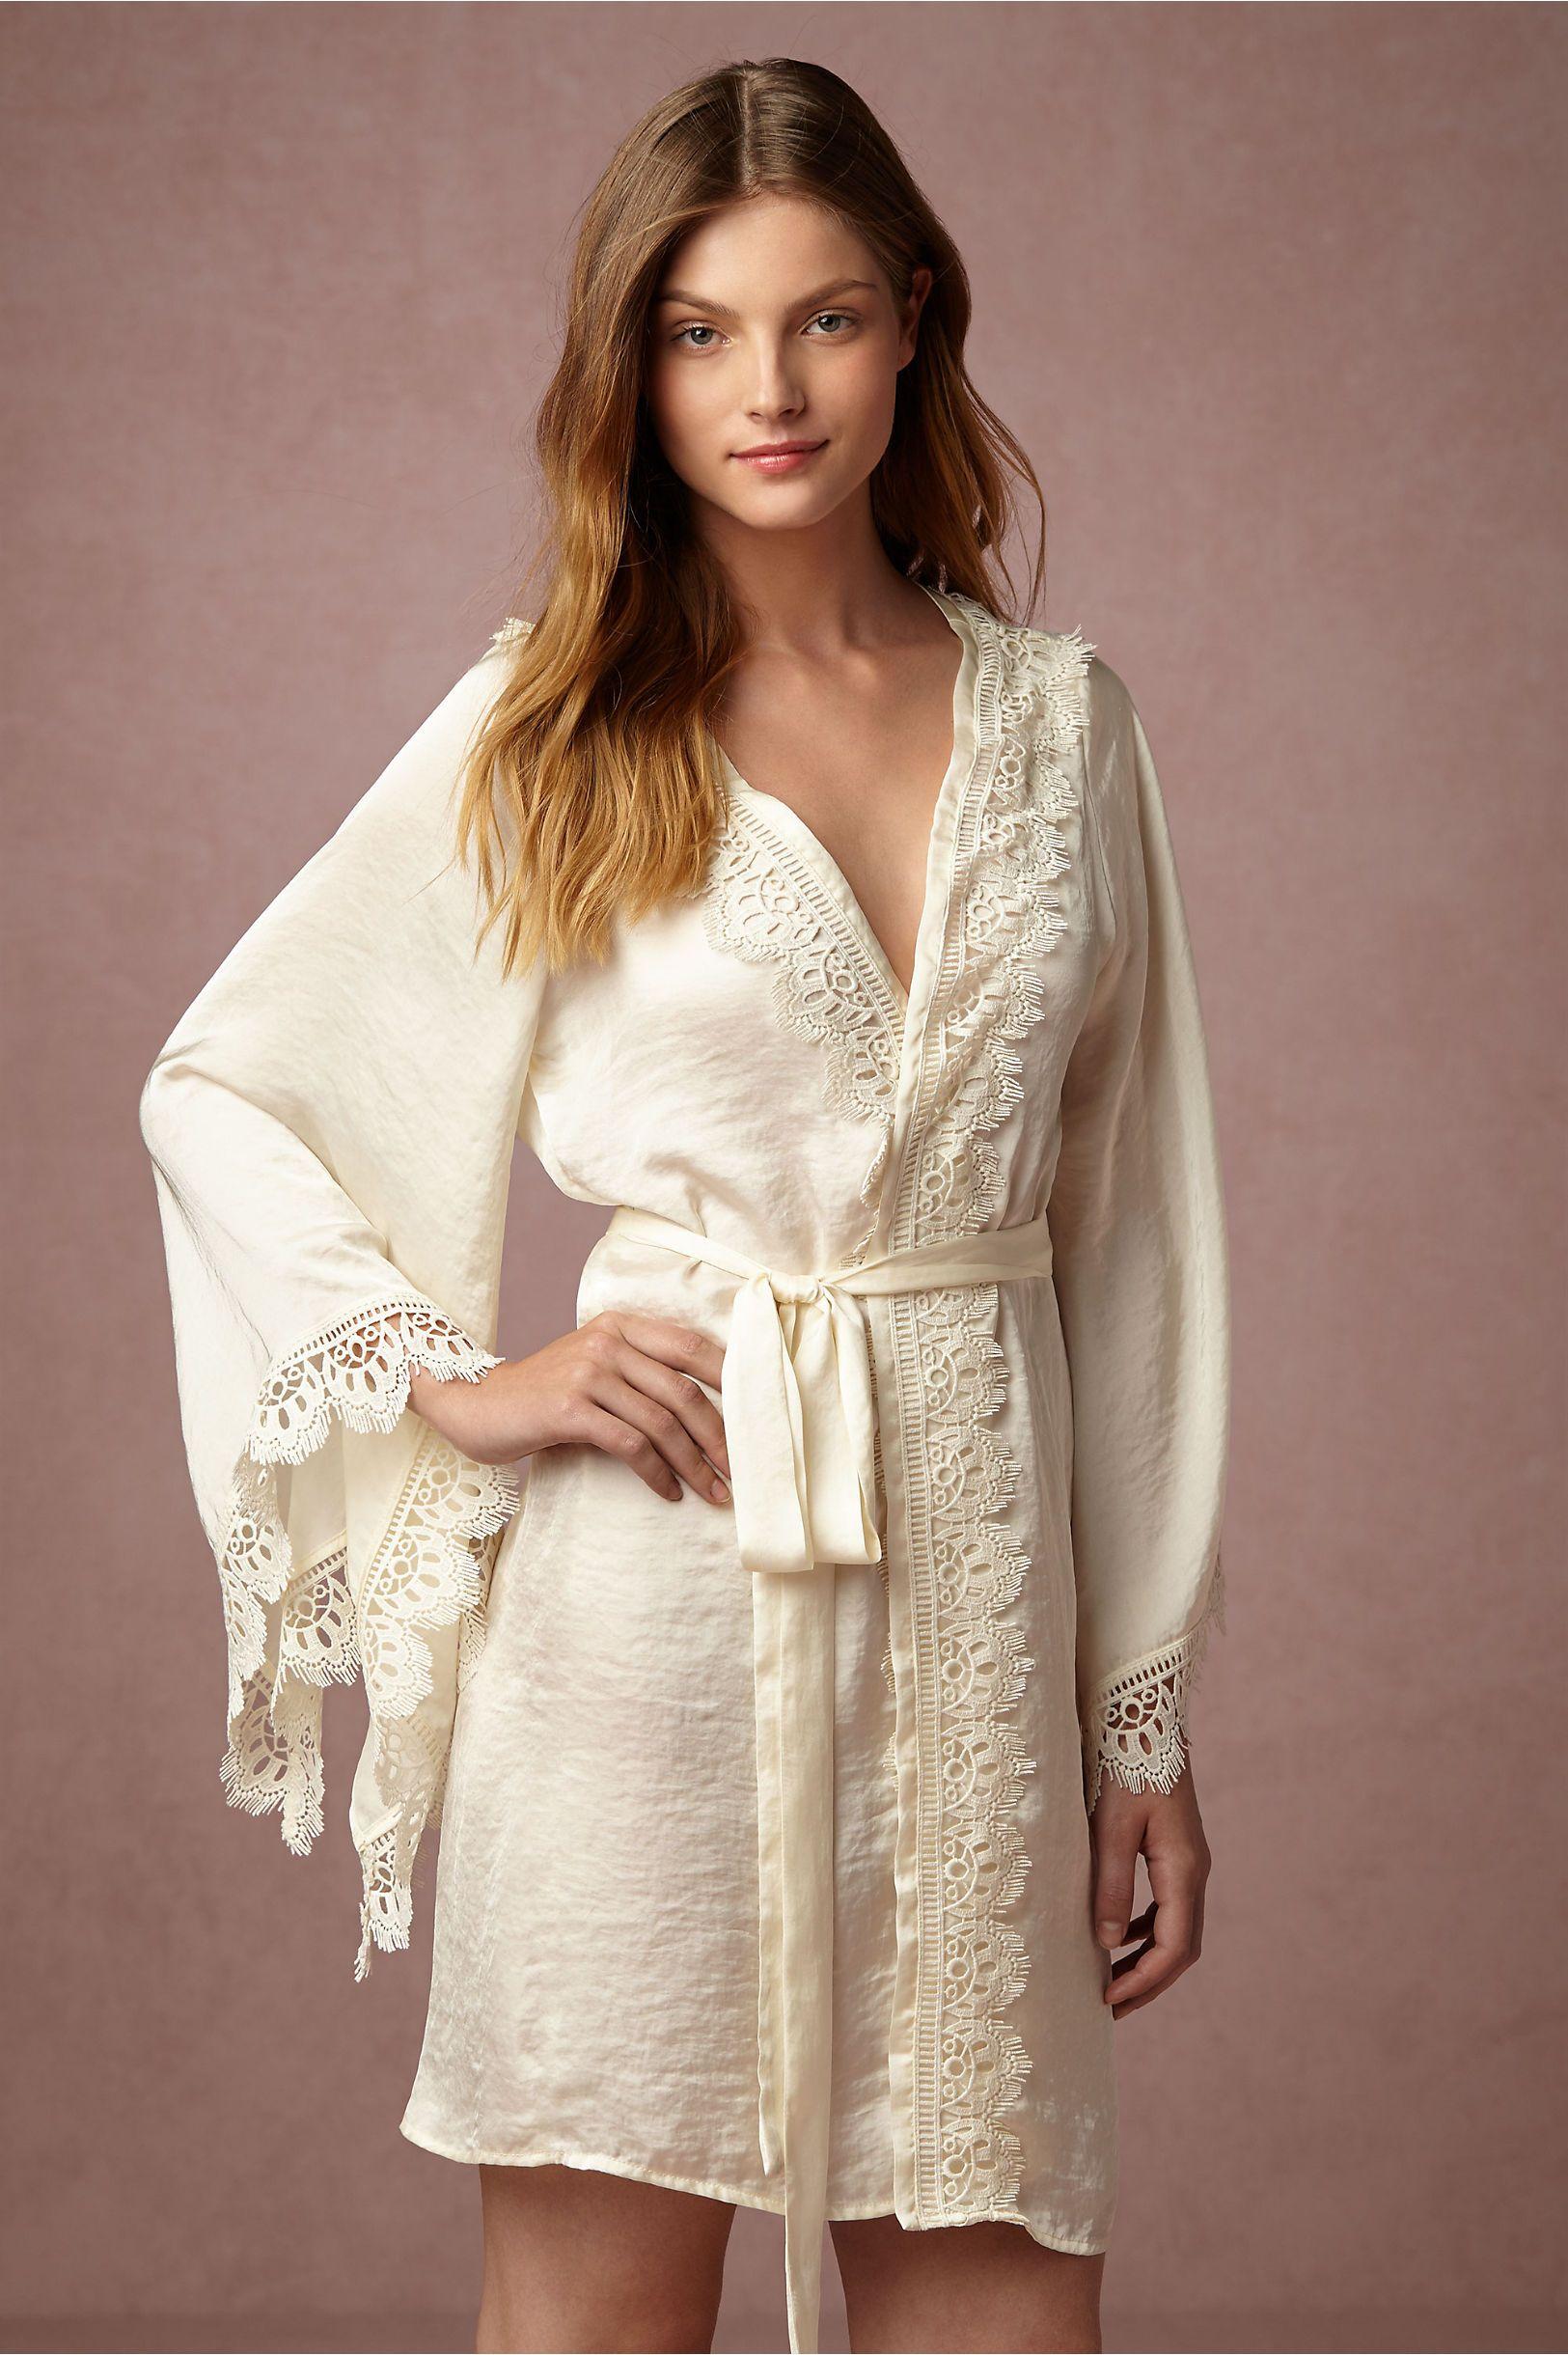 BHLDN Suri Kimono Robe in Bride Bridal Lingerie  b9621339b